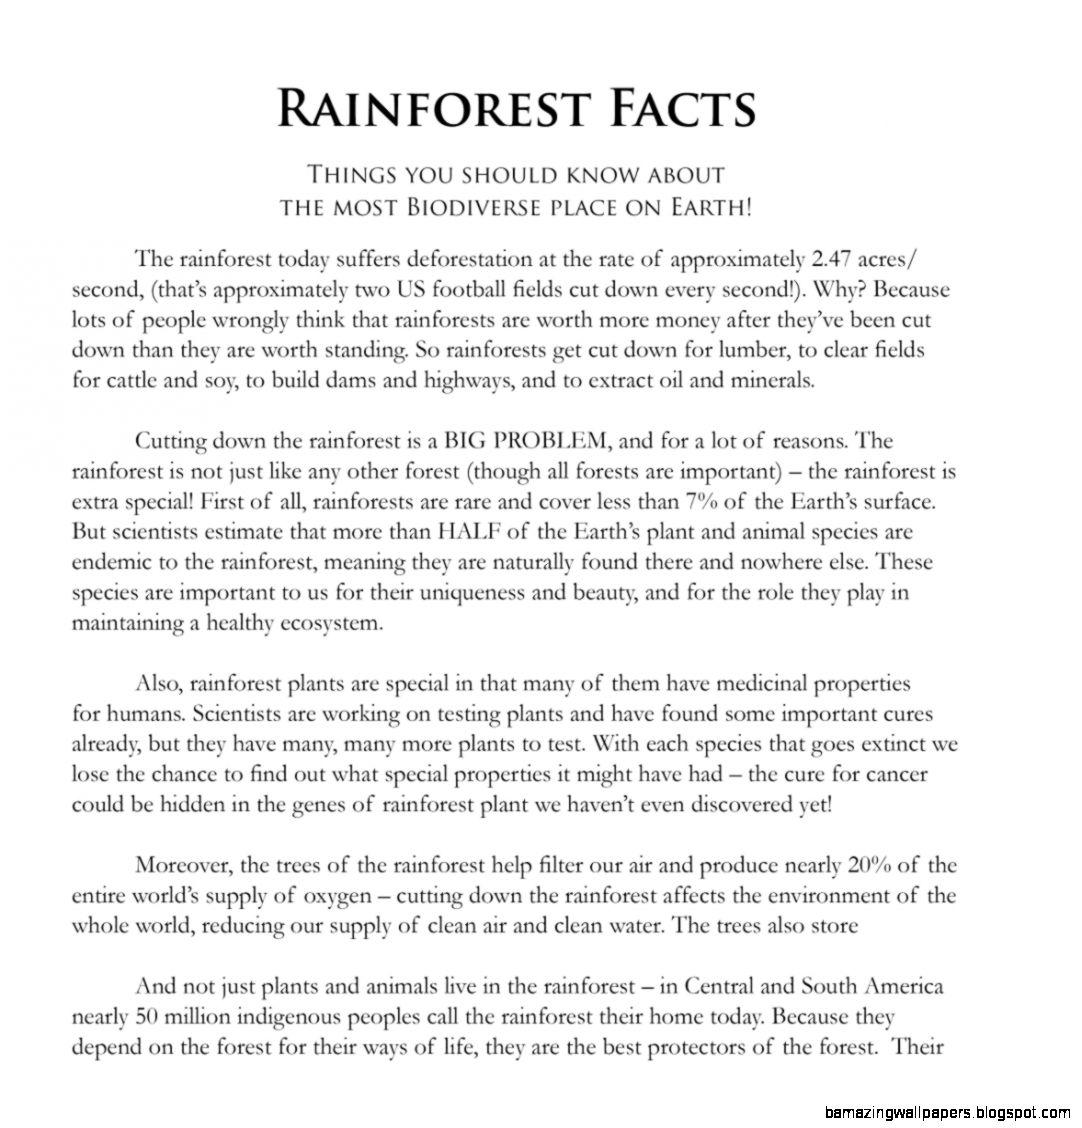 Rainforest Facts